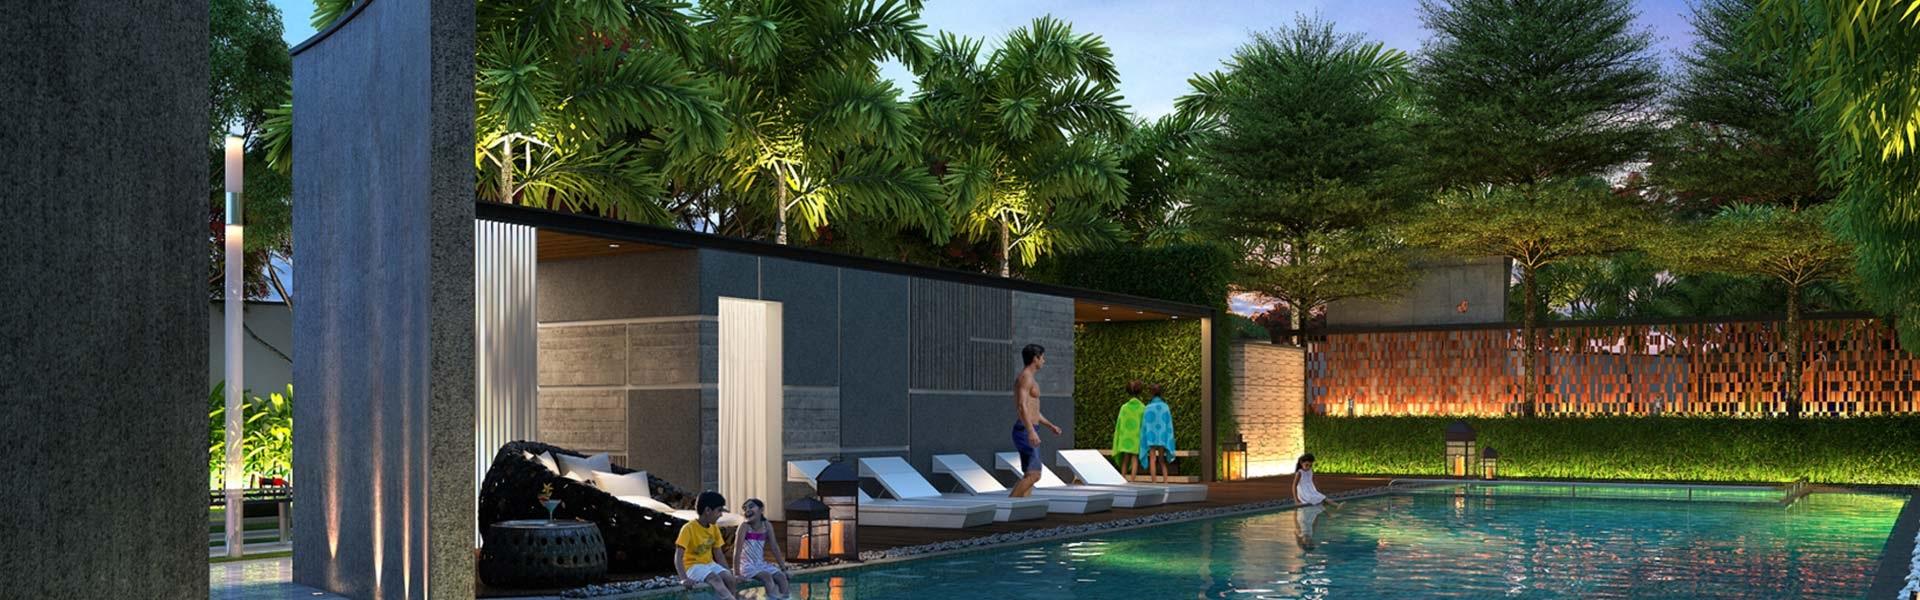 dsr rr avenues amenities features4